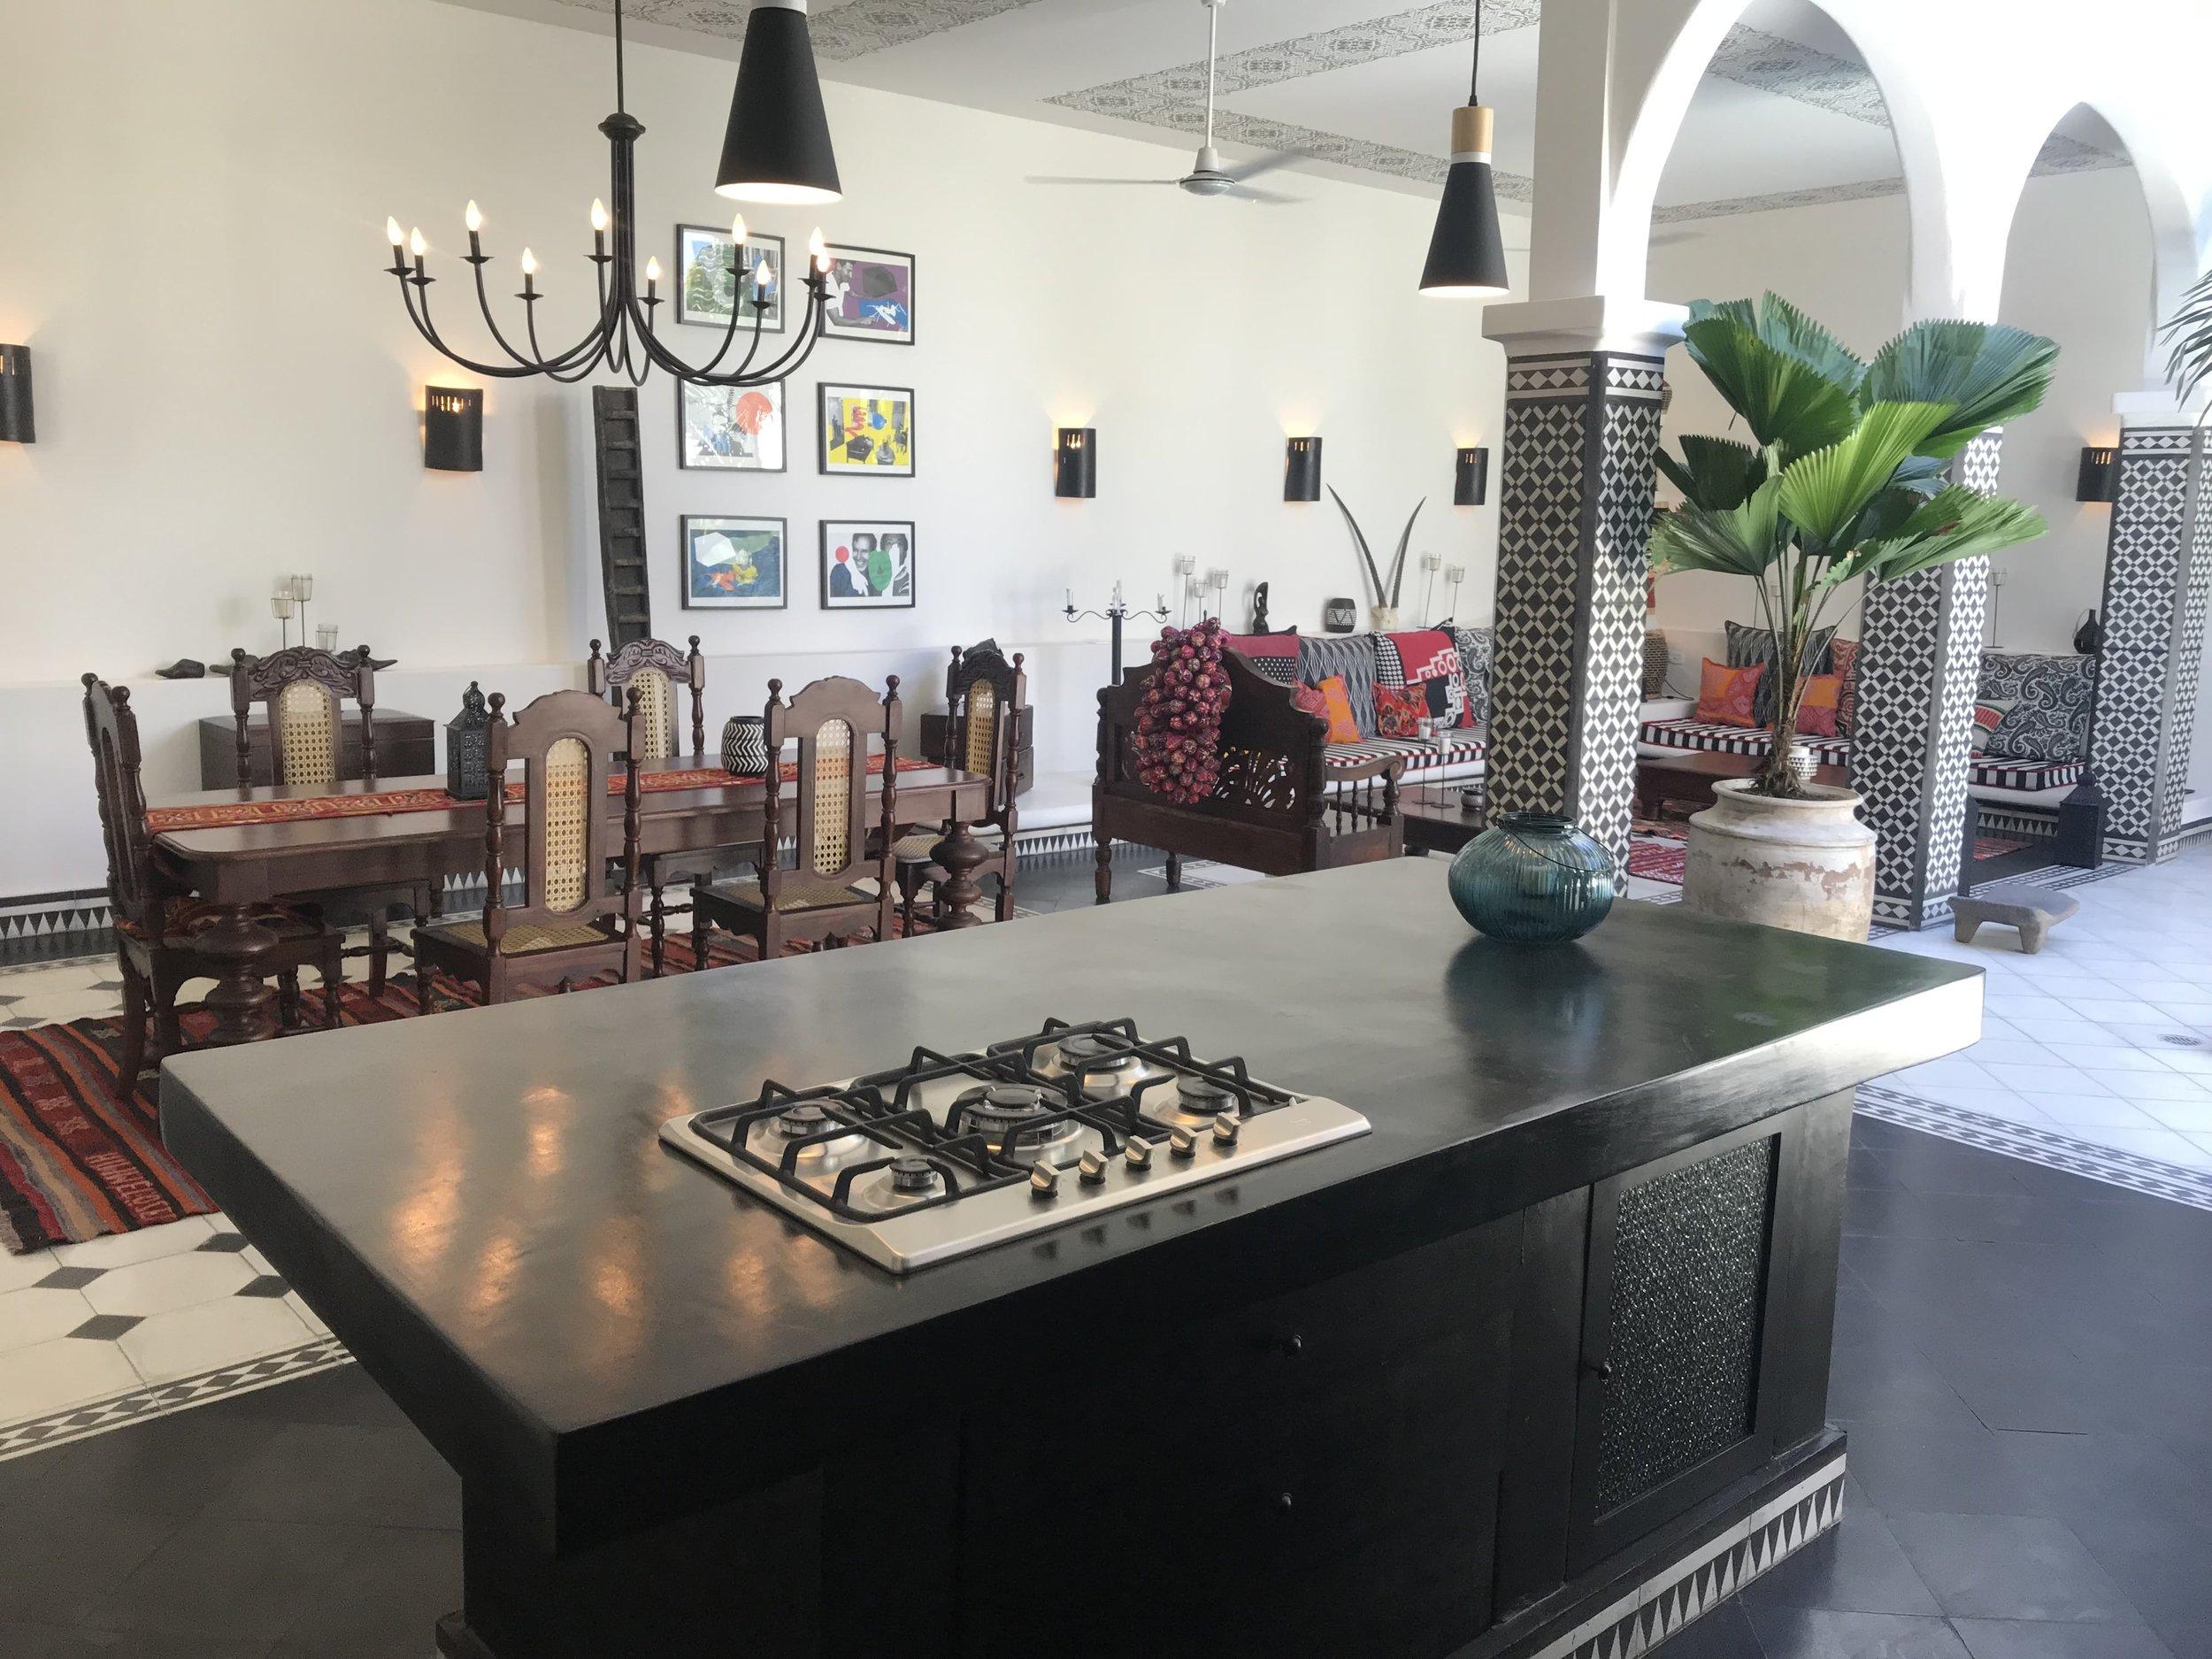 Real Estate For Sale Granada Nicaragua 19-min.jpg